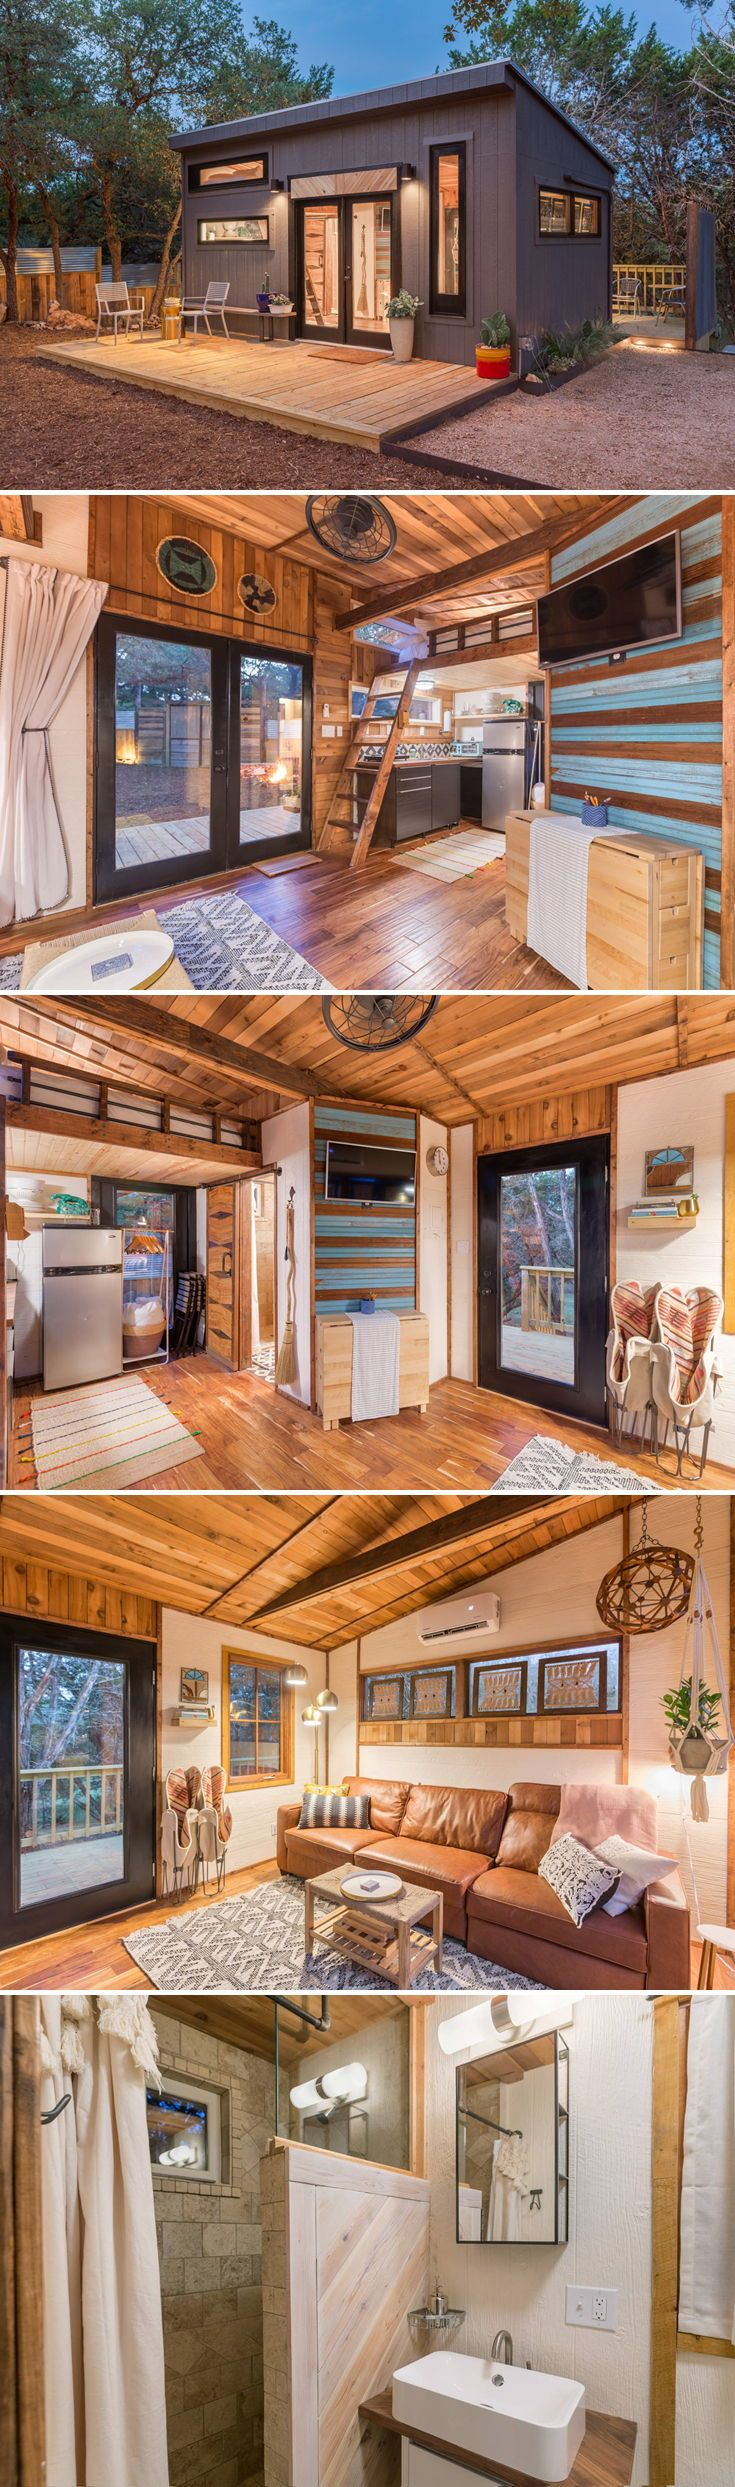 Photo of Sundown Tiny Home